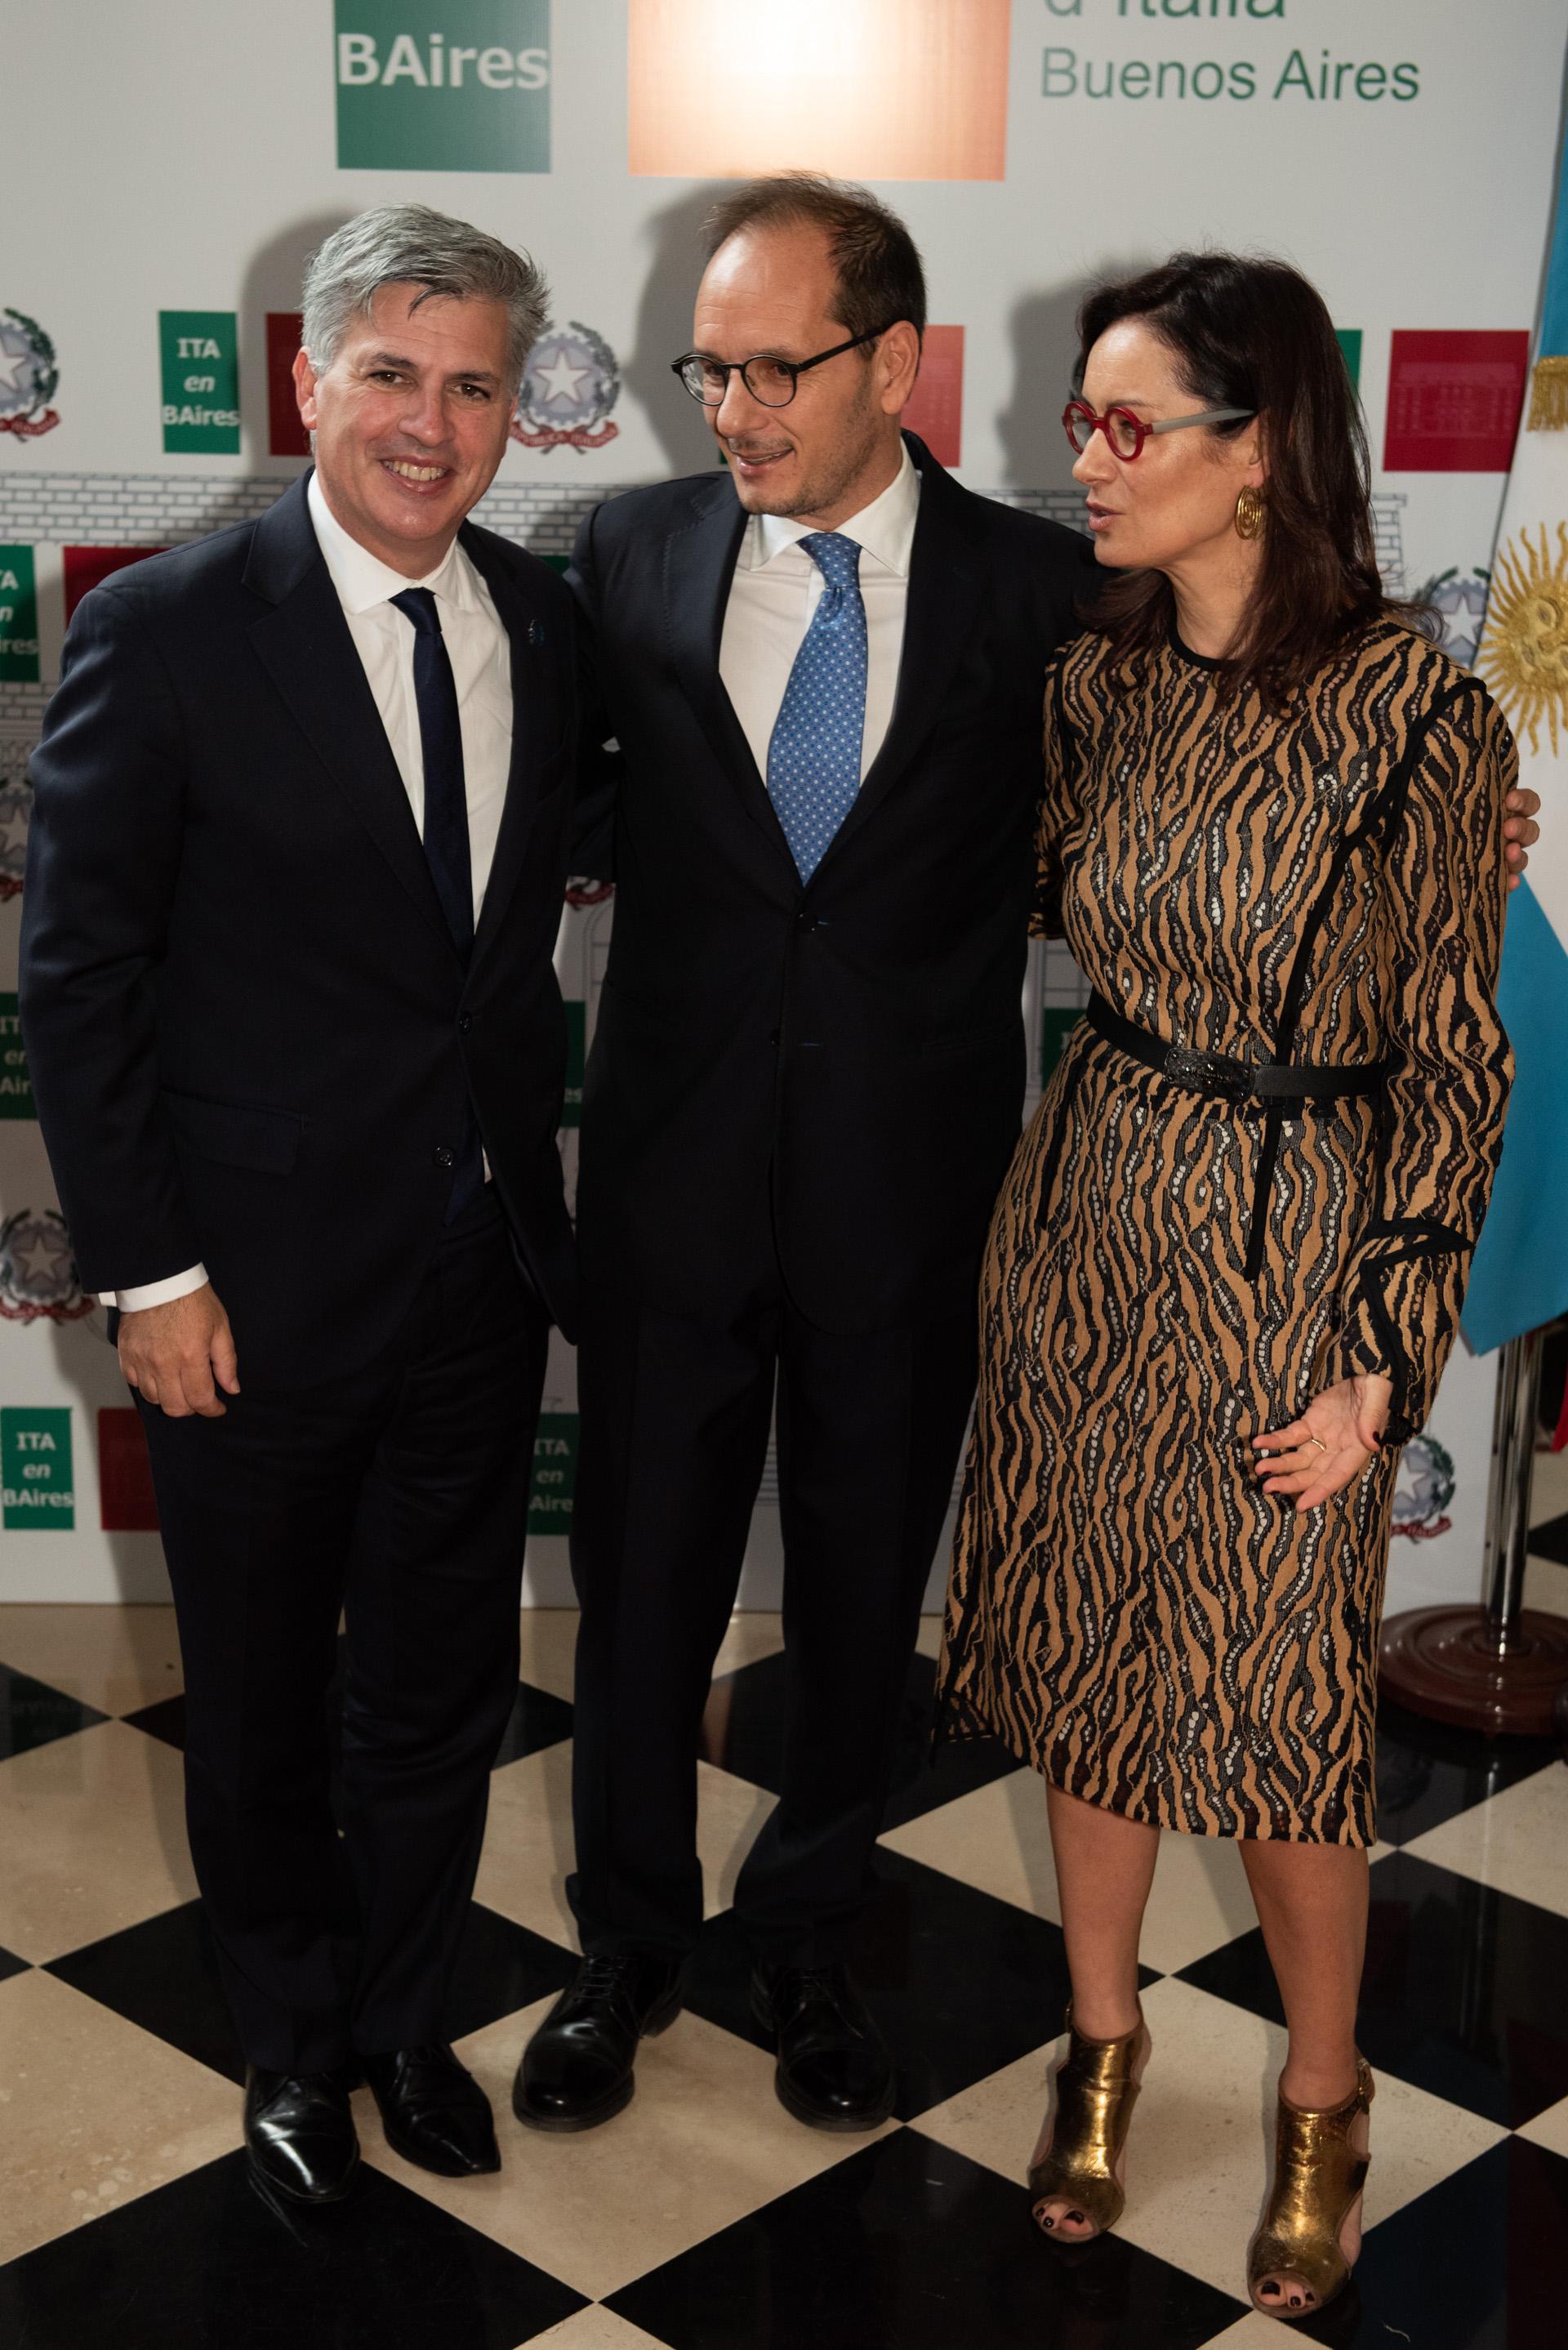 El representante argentino ante la OCDE, Marcelo Scaglione